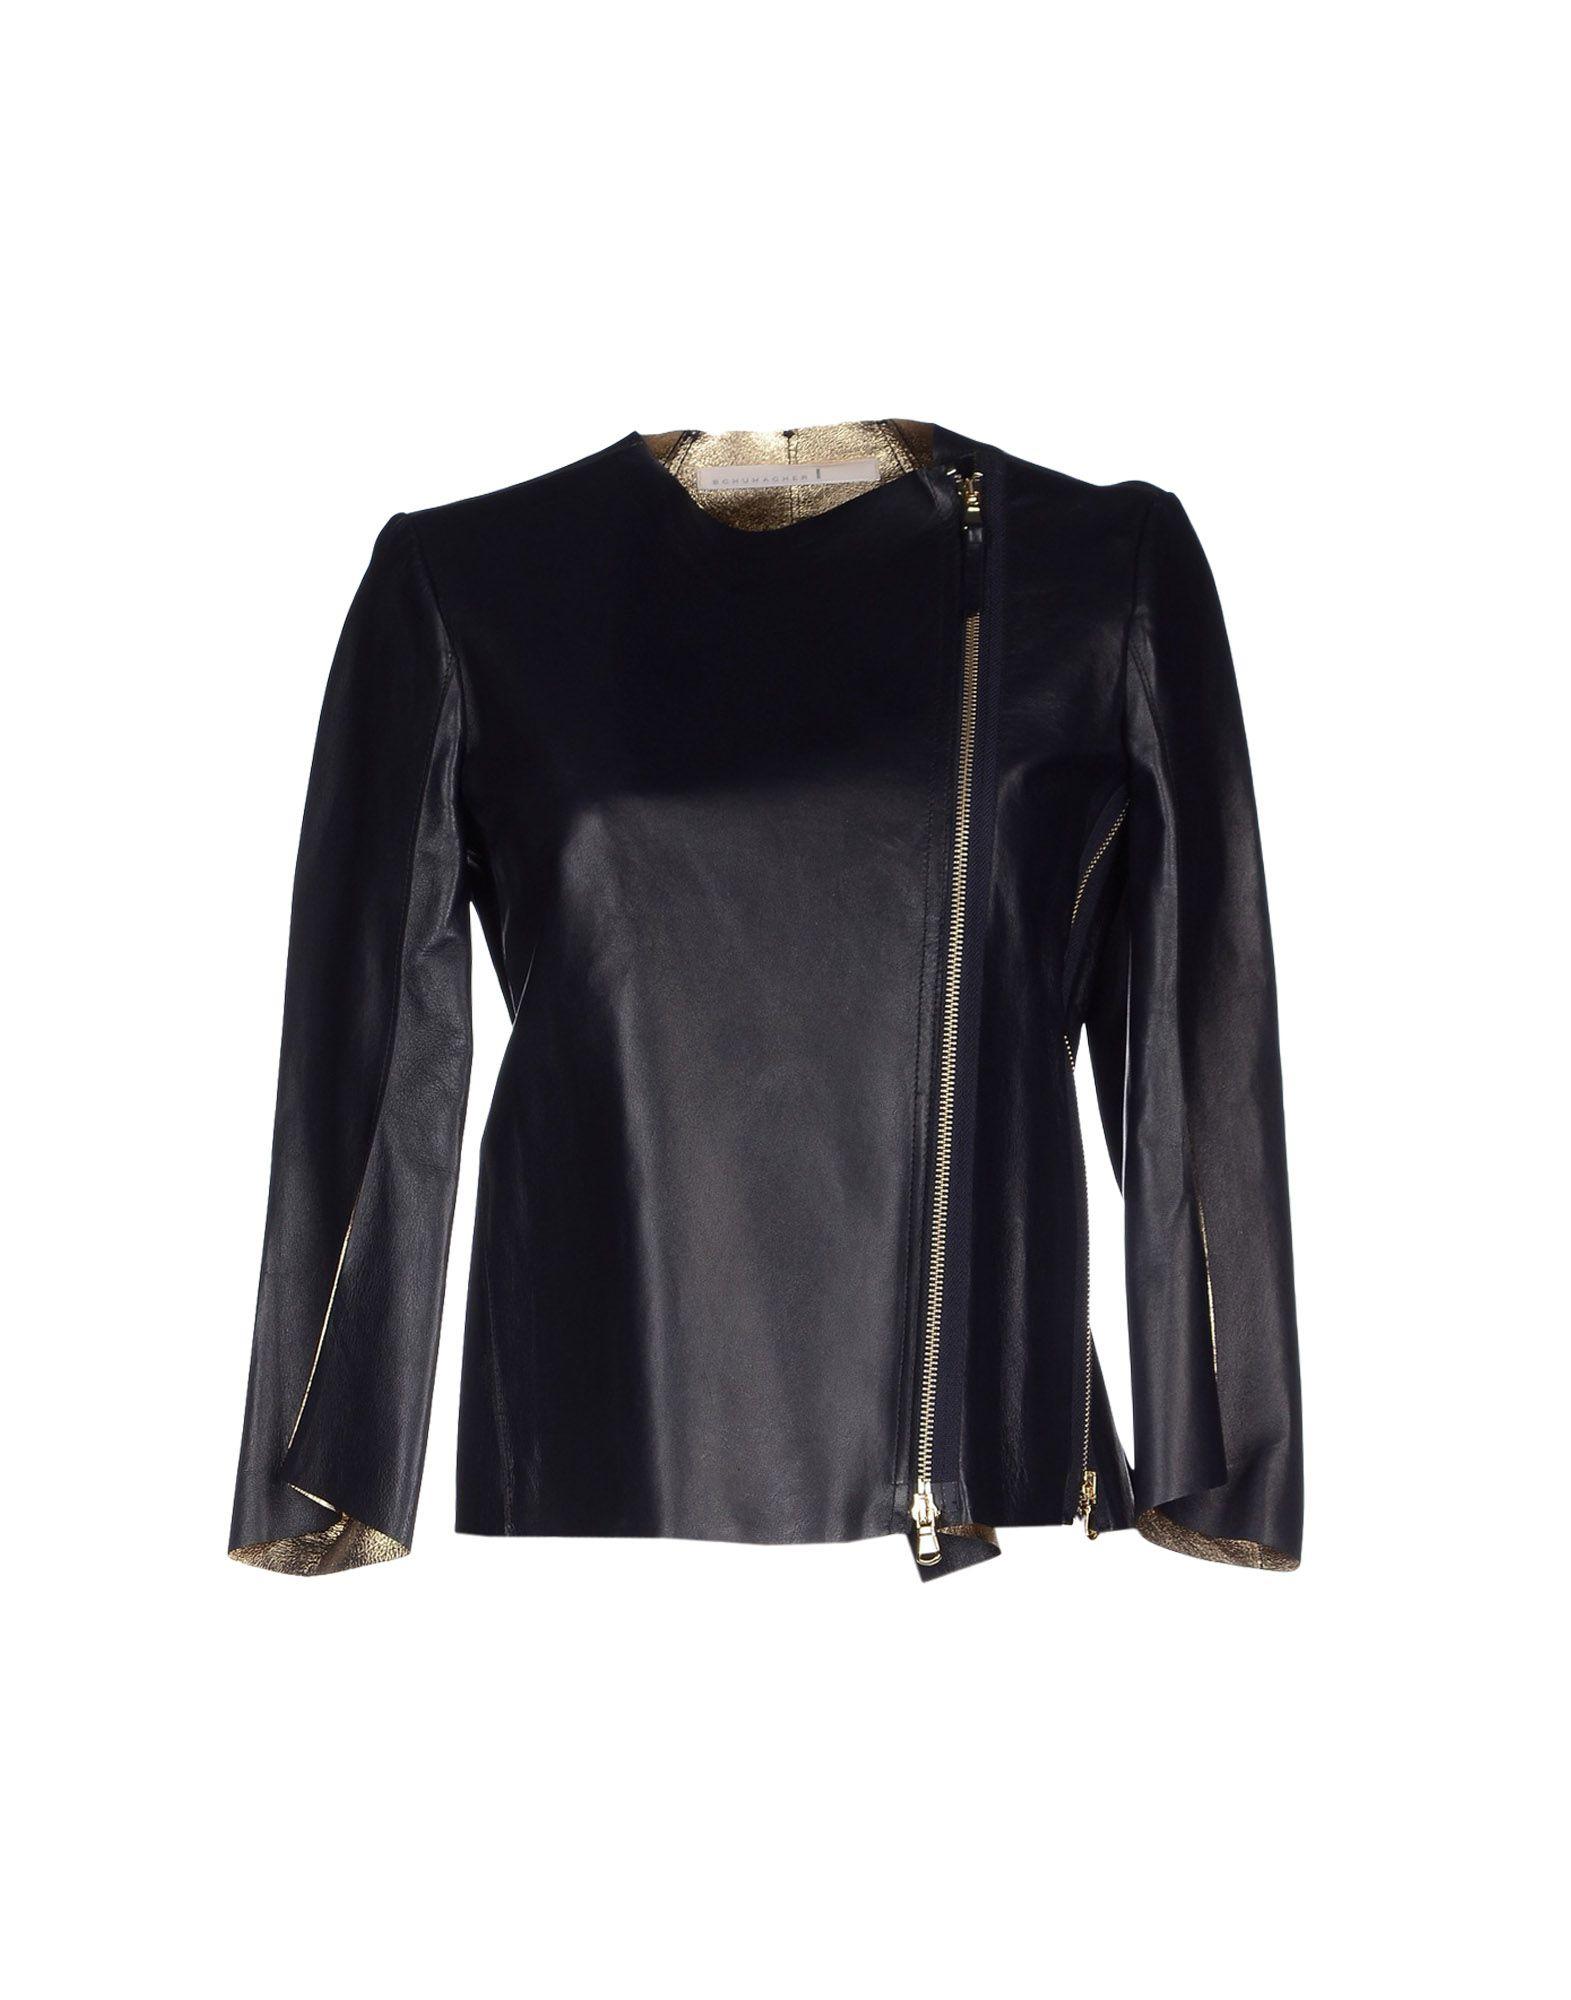 bluejacket black single women Women's jackets 1024 items quick view bobeau bobeau peri jacket with opening ceremony womens black dr $49500 $15000 70% off.